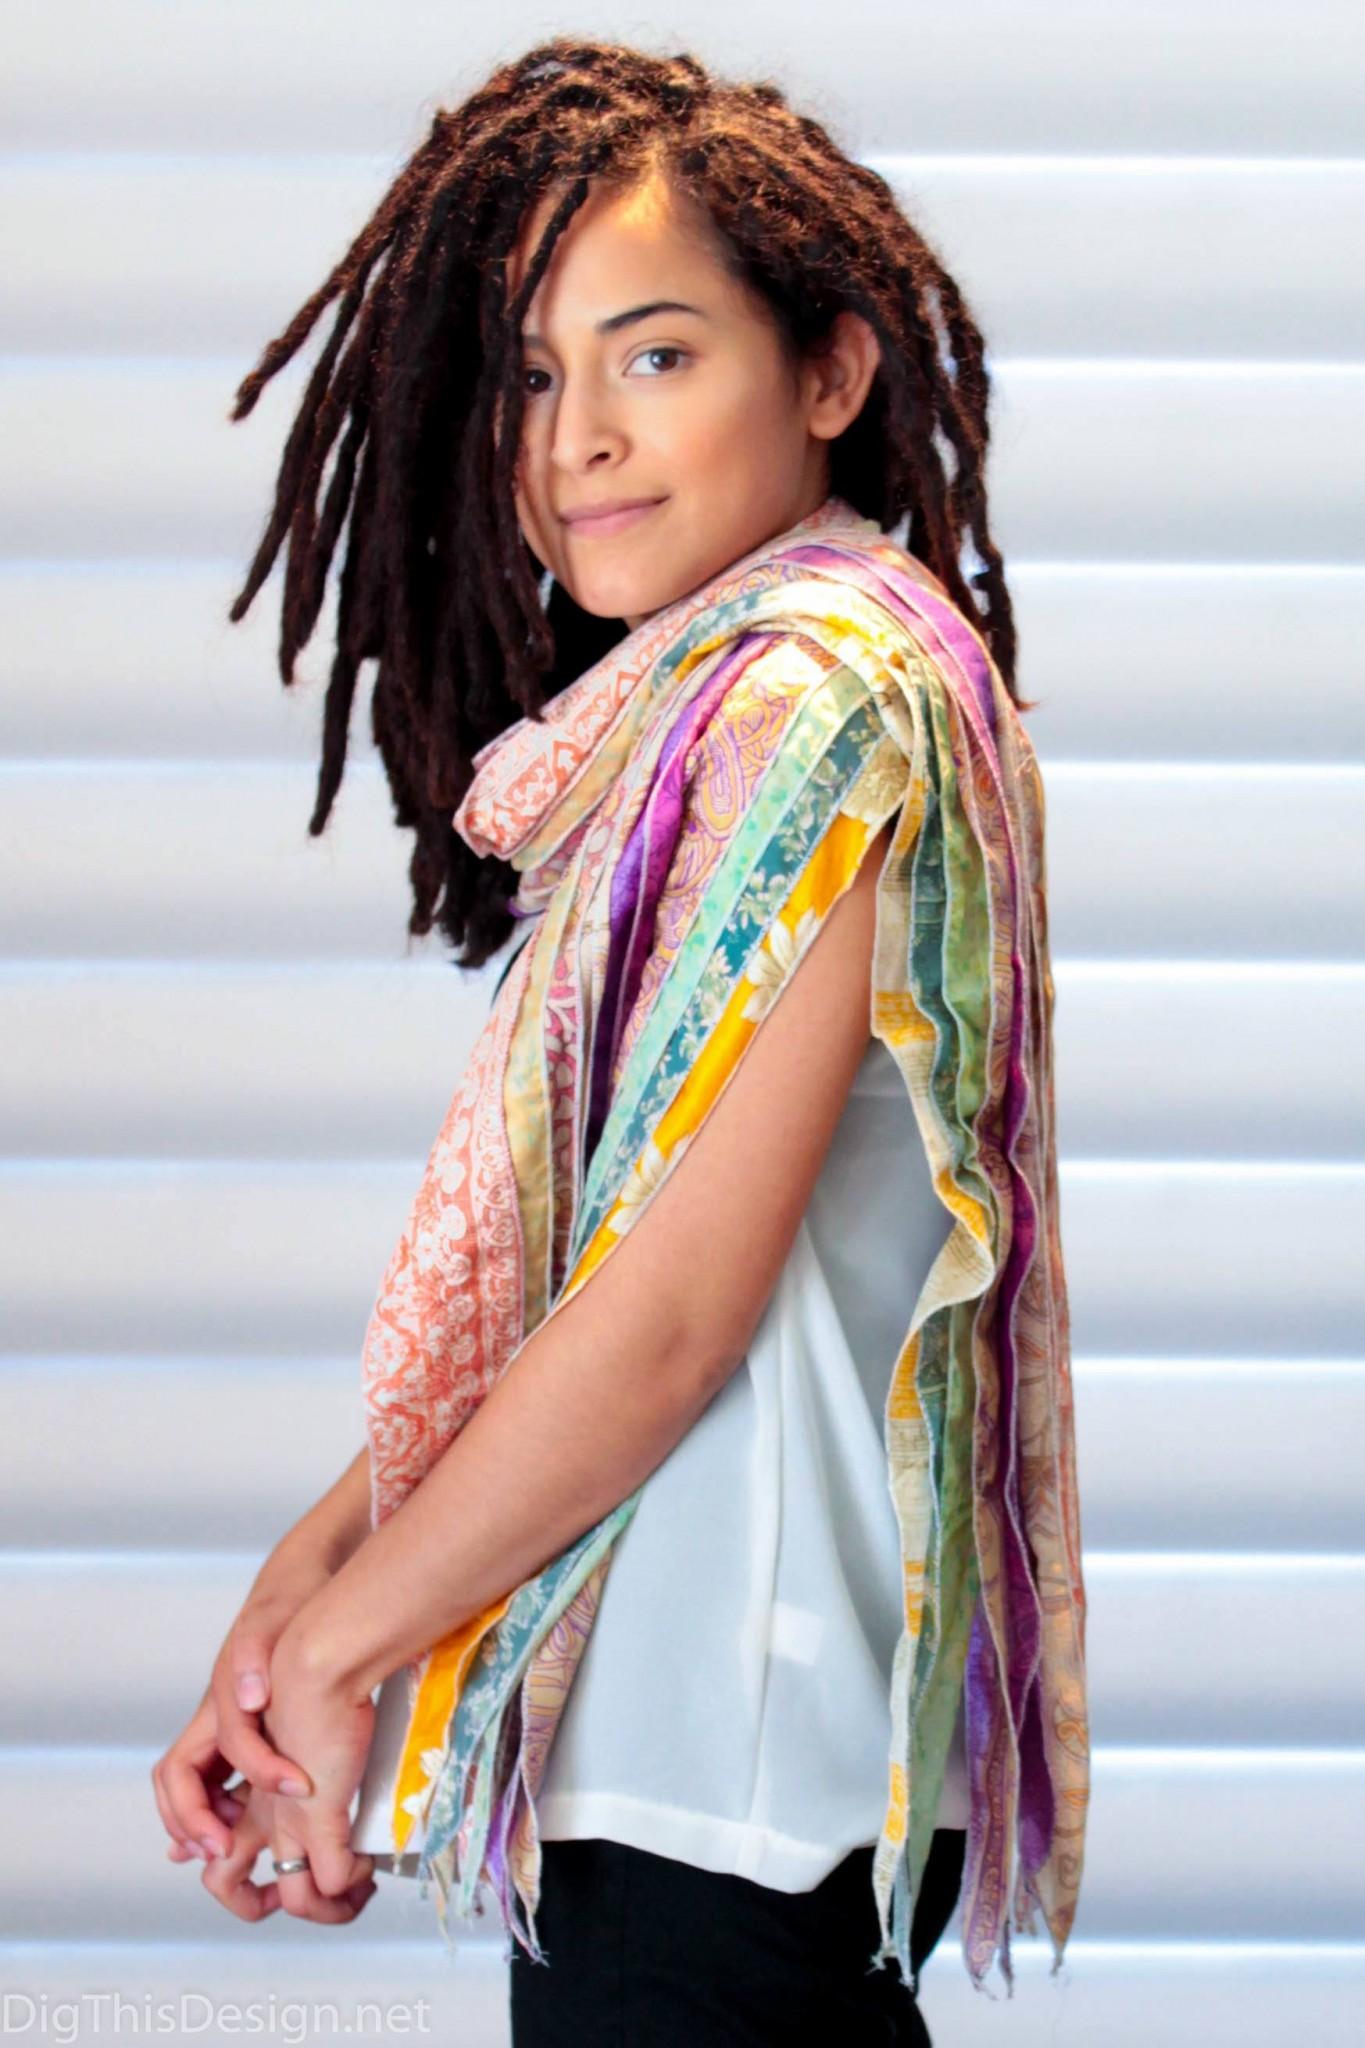 Woman wearing a colorful boho chic wrap.